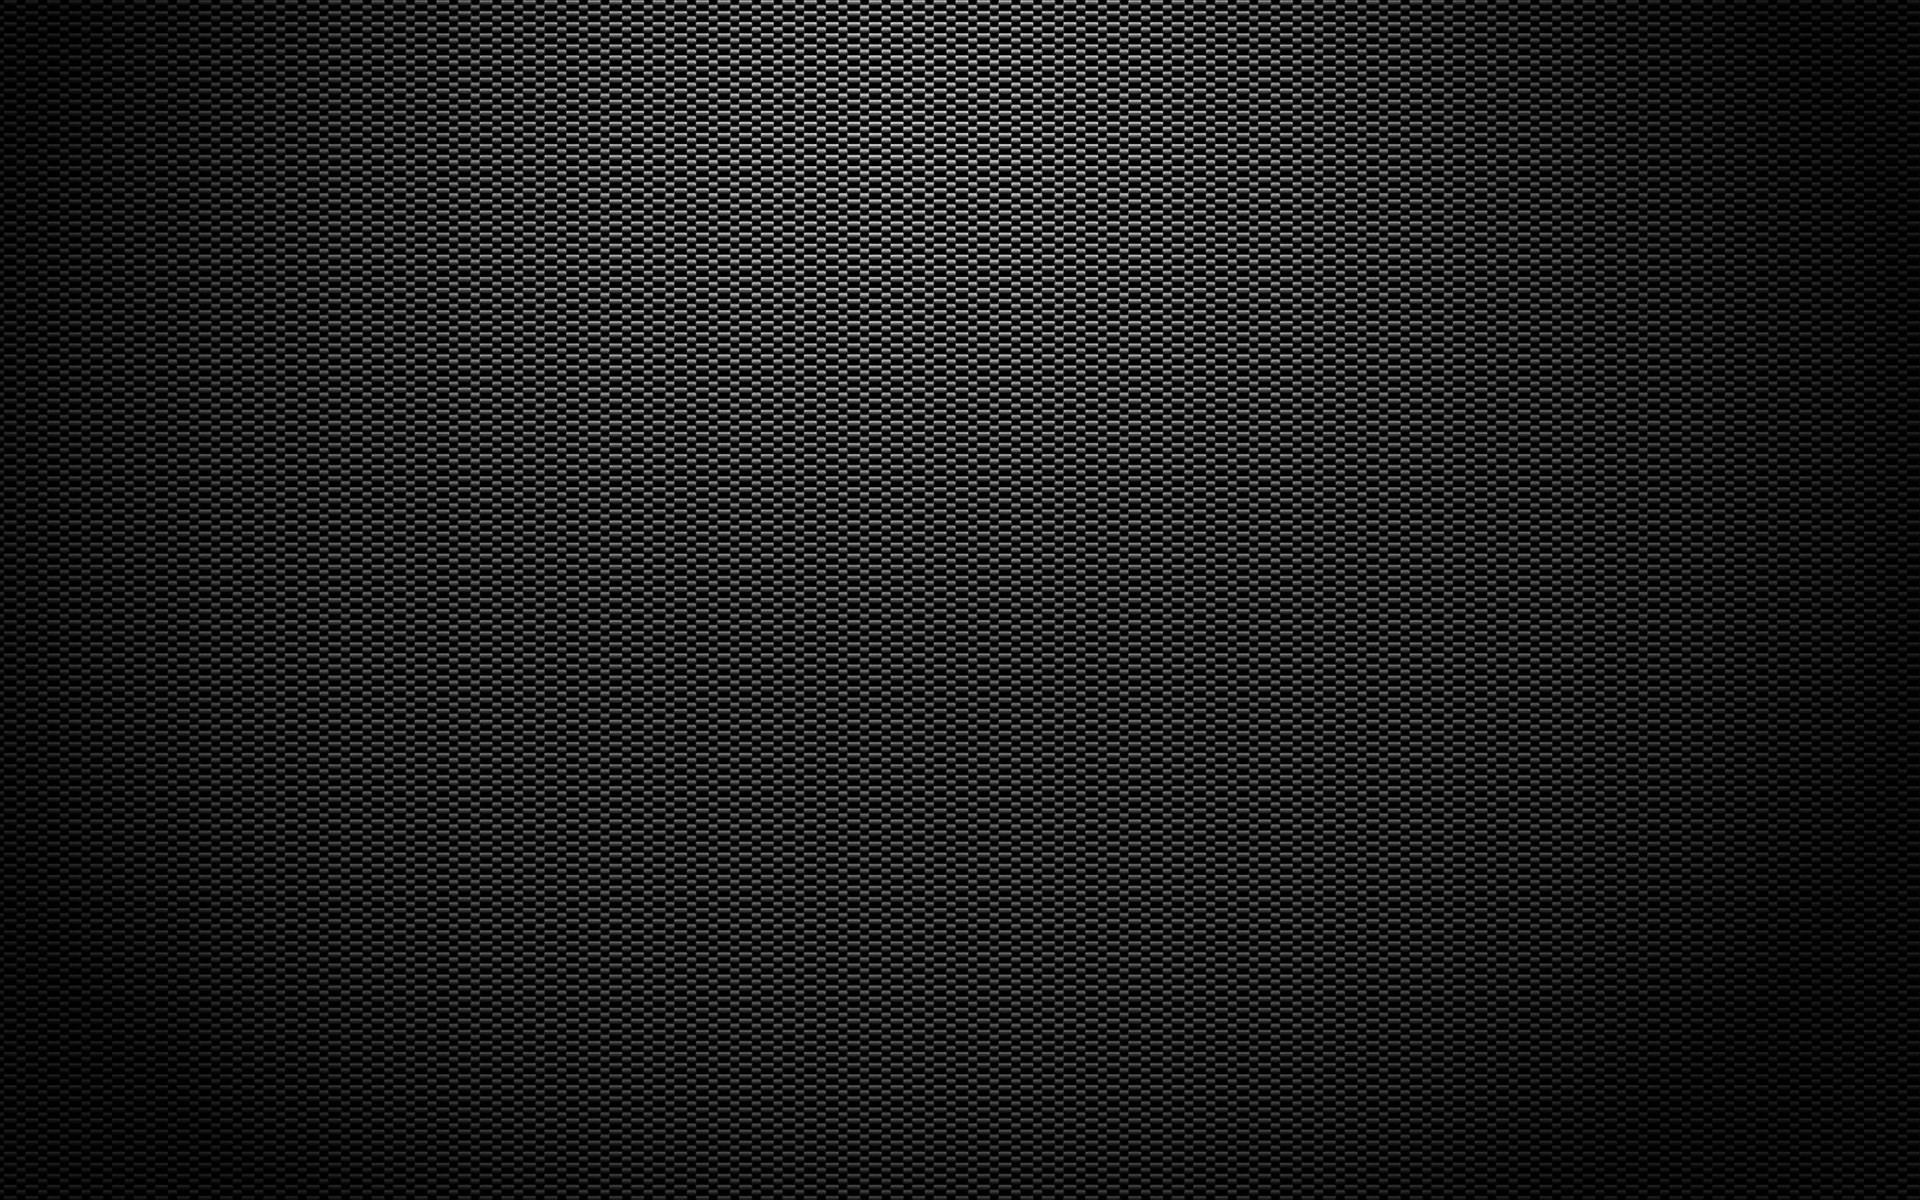 carbon fiber best wallpapers free